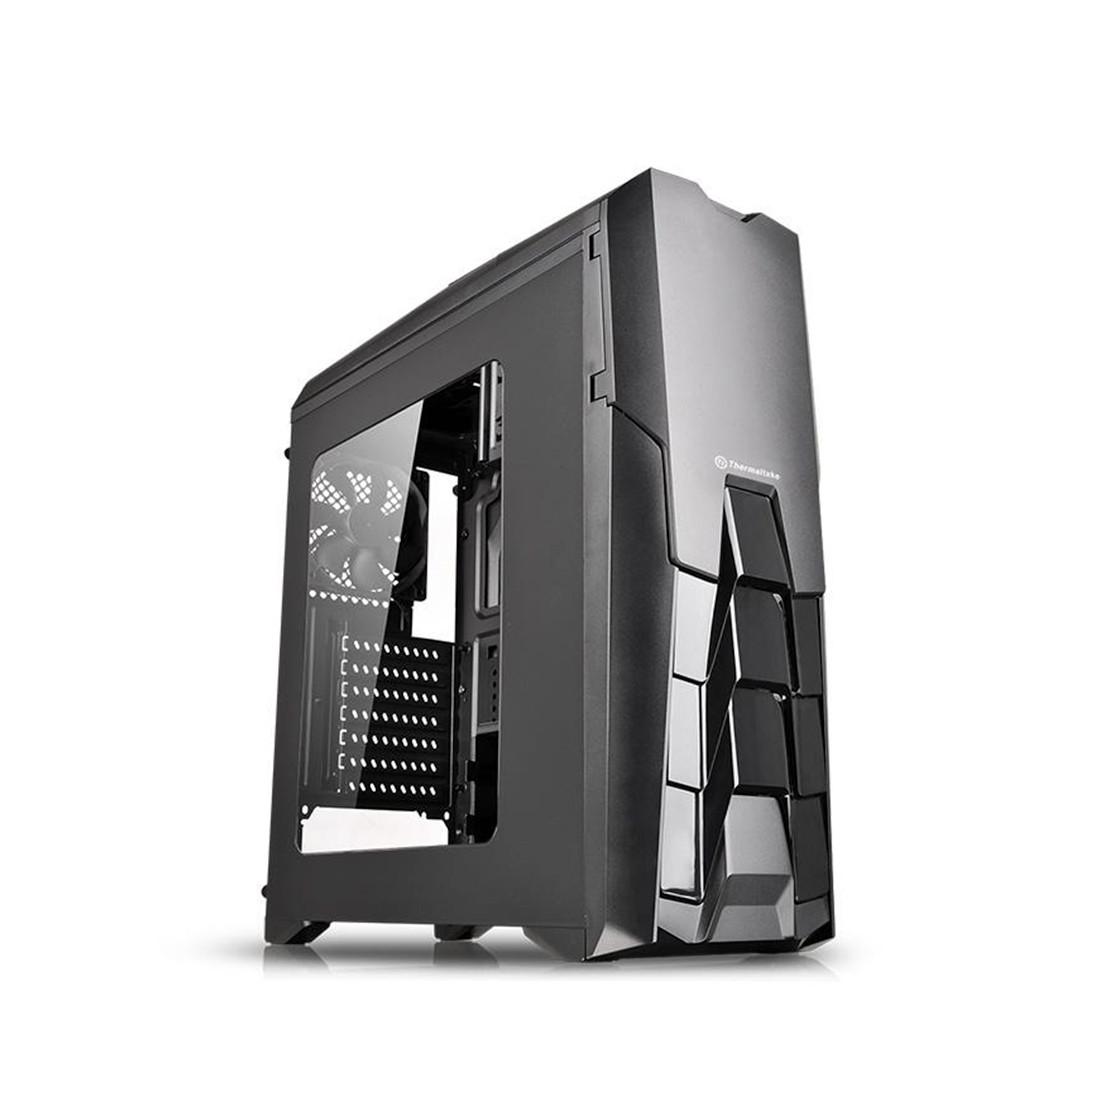 Компьютерный корпус Thermaltake Versa N25